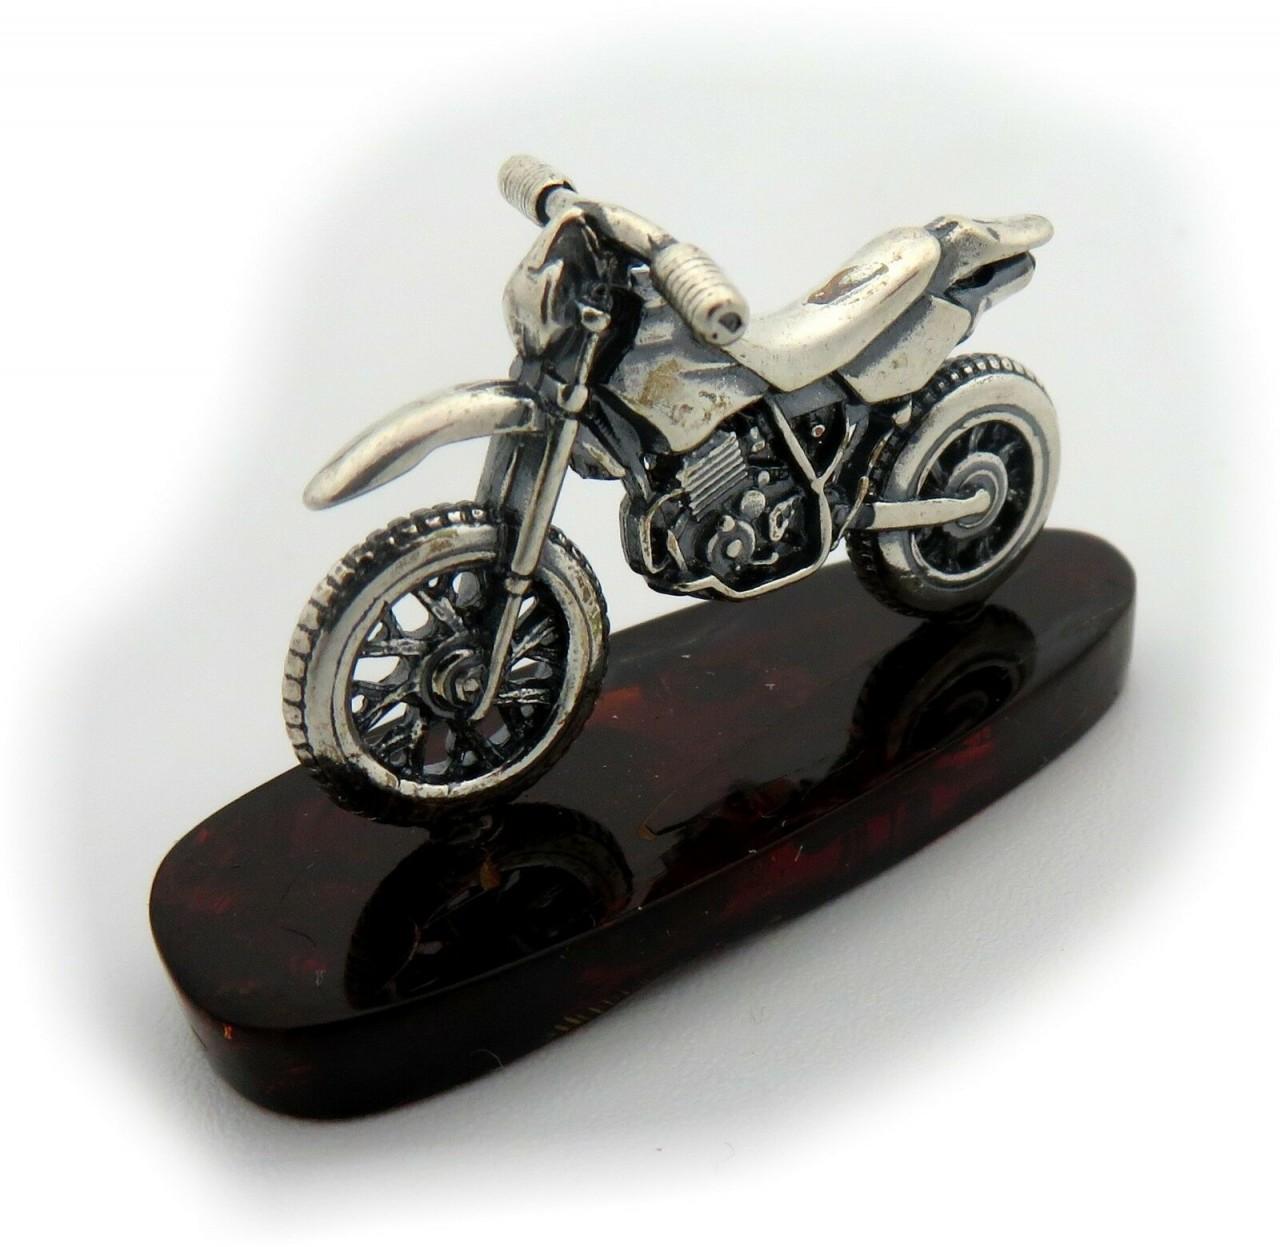 Neu Motorrad echter Bernstein aus der Ostsee Sterlingsilber 925 Enduro Moped